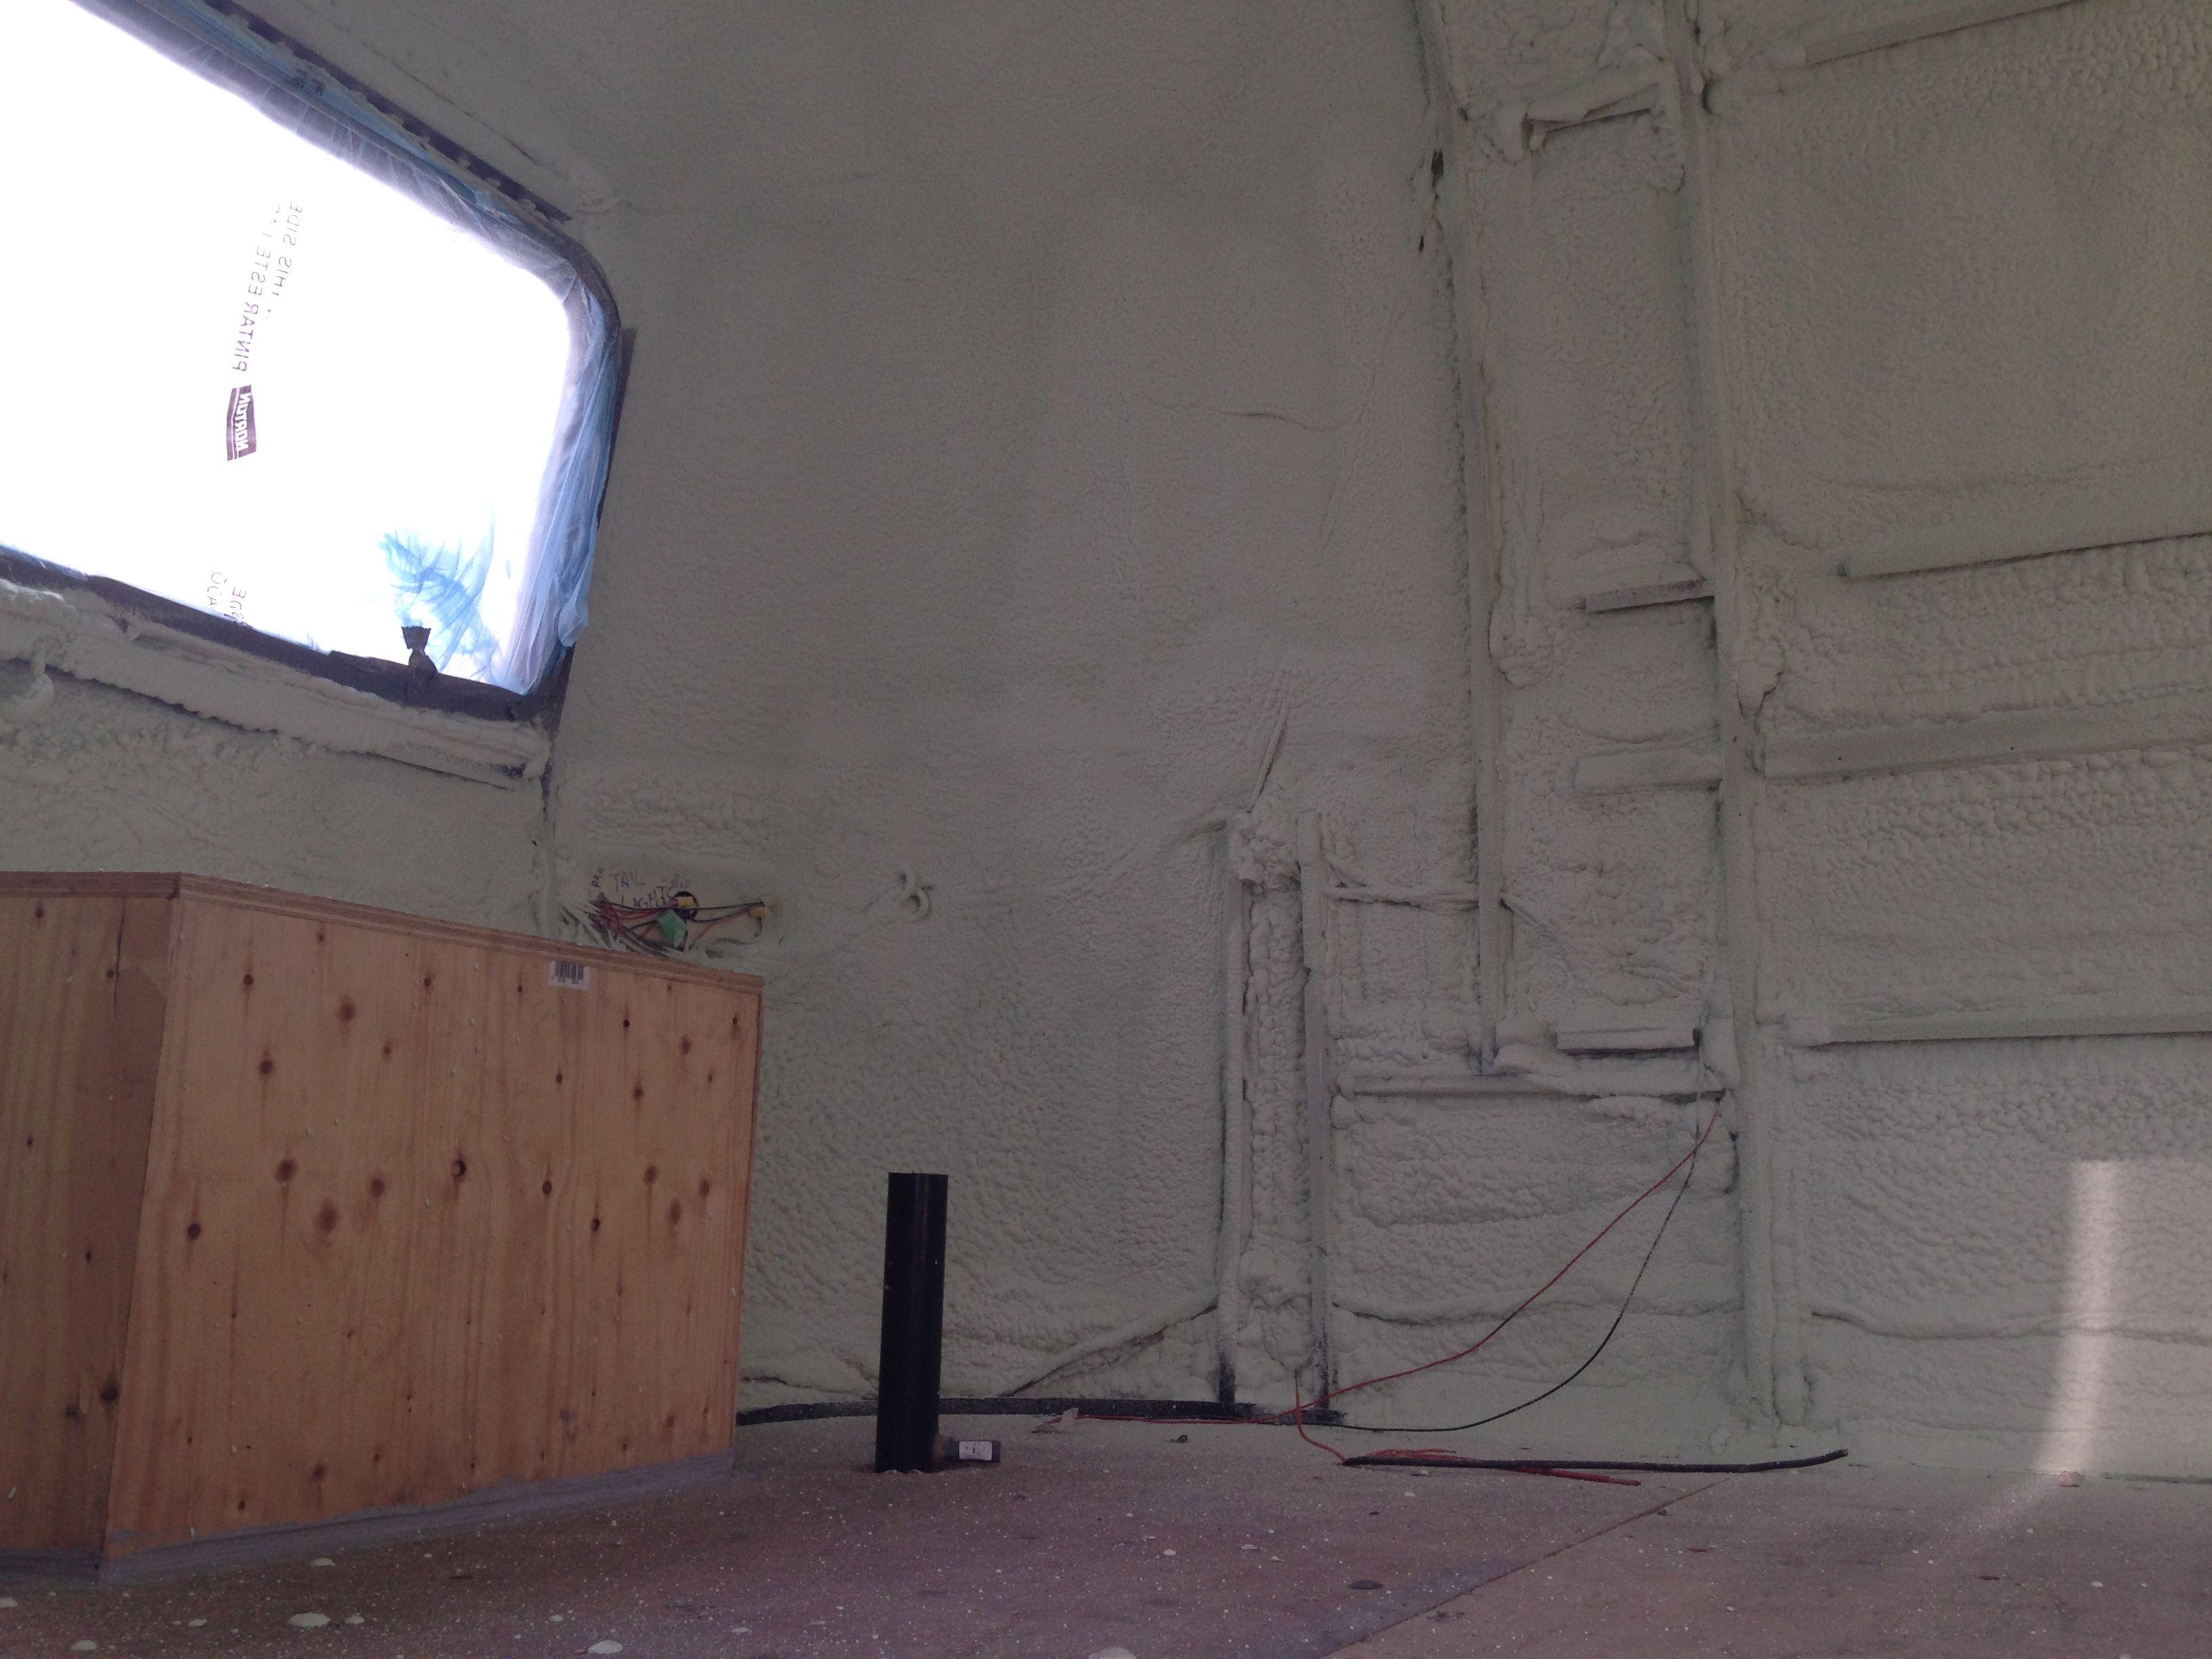 Spray foam insulation in an Airstream trailer. http